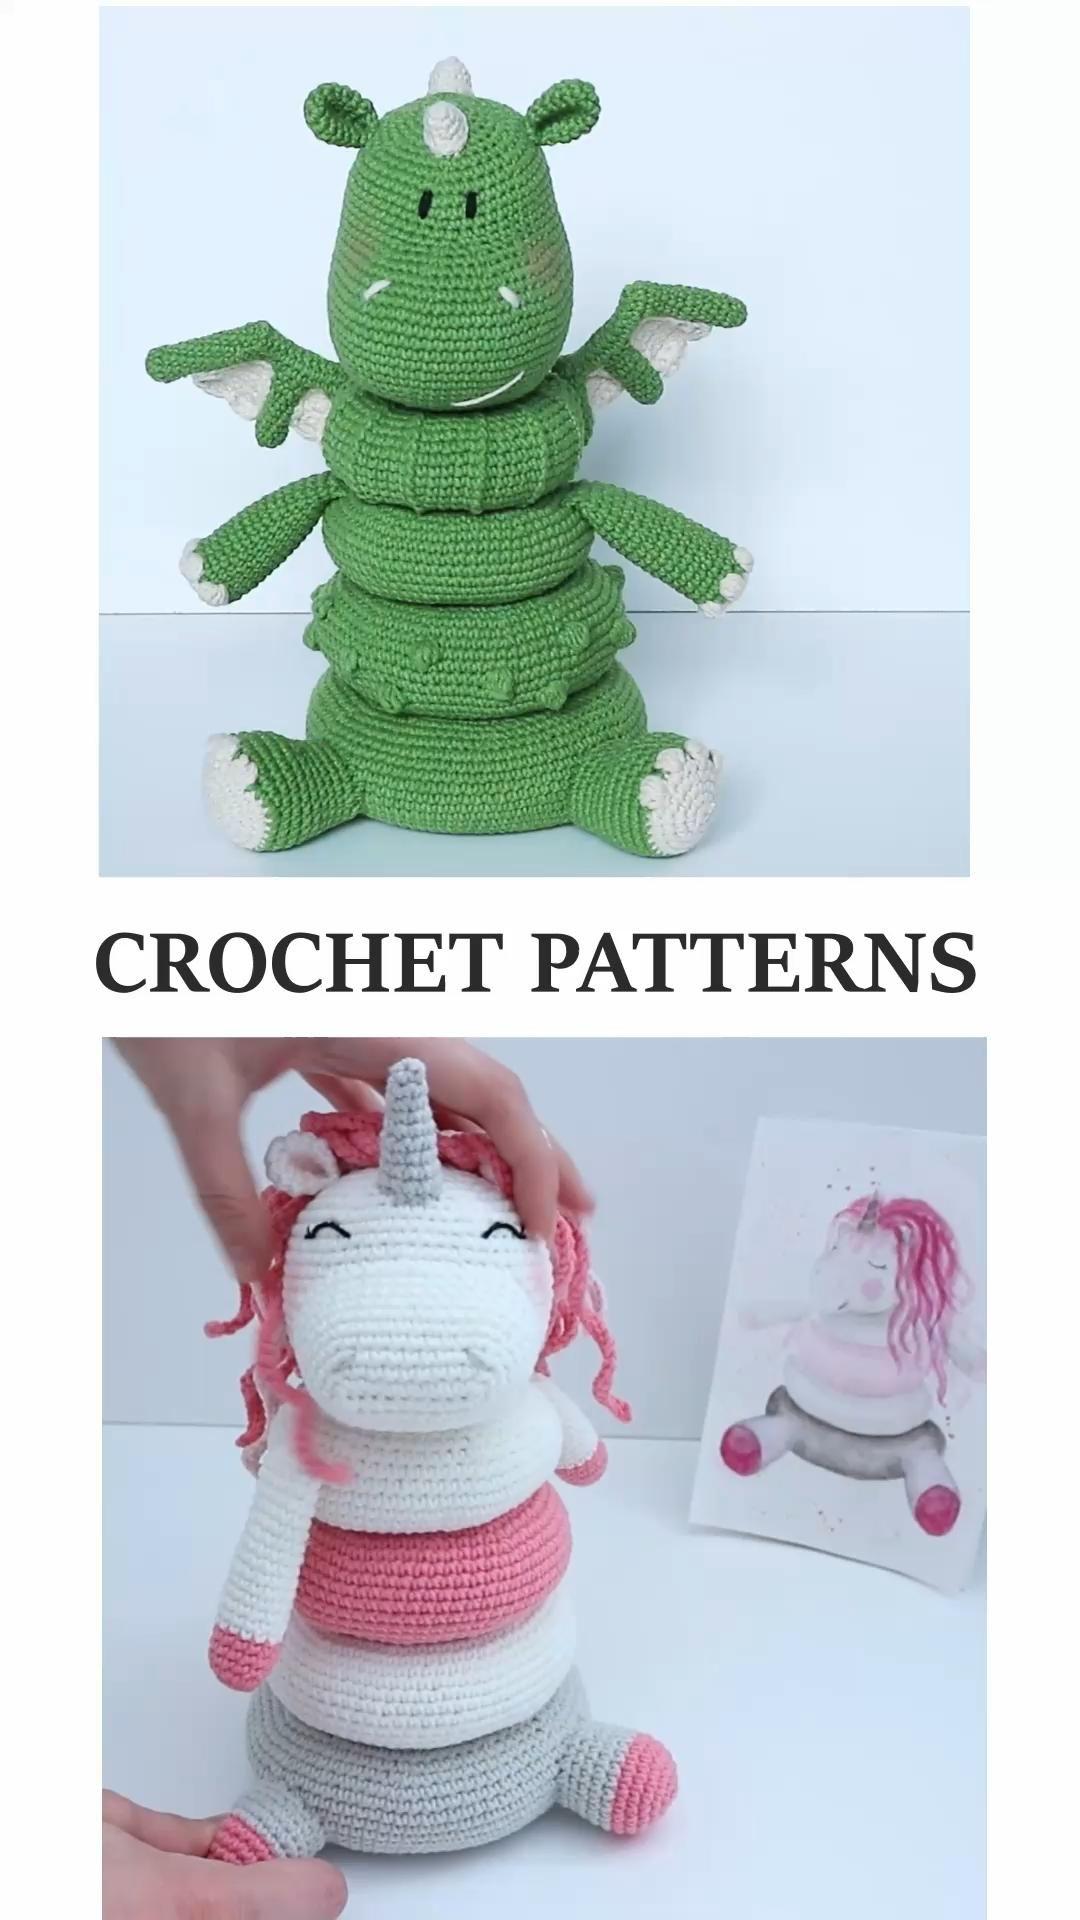 Dragon amigurumi pattern: Stacking Toy Rings, Croc